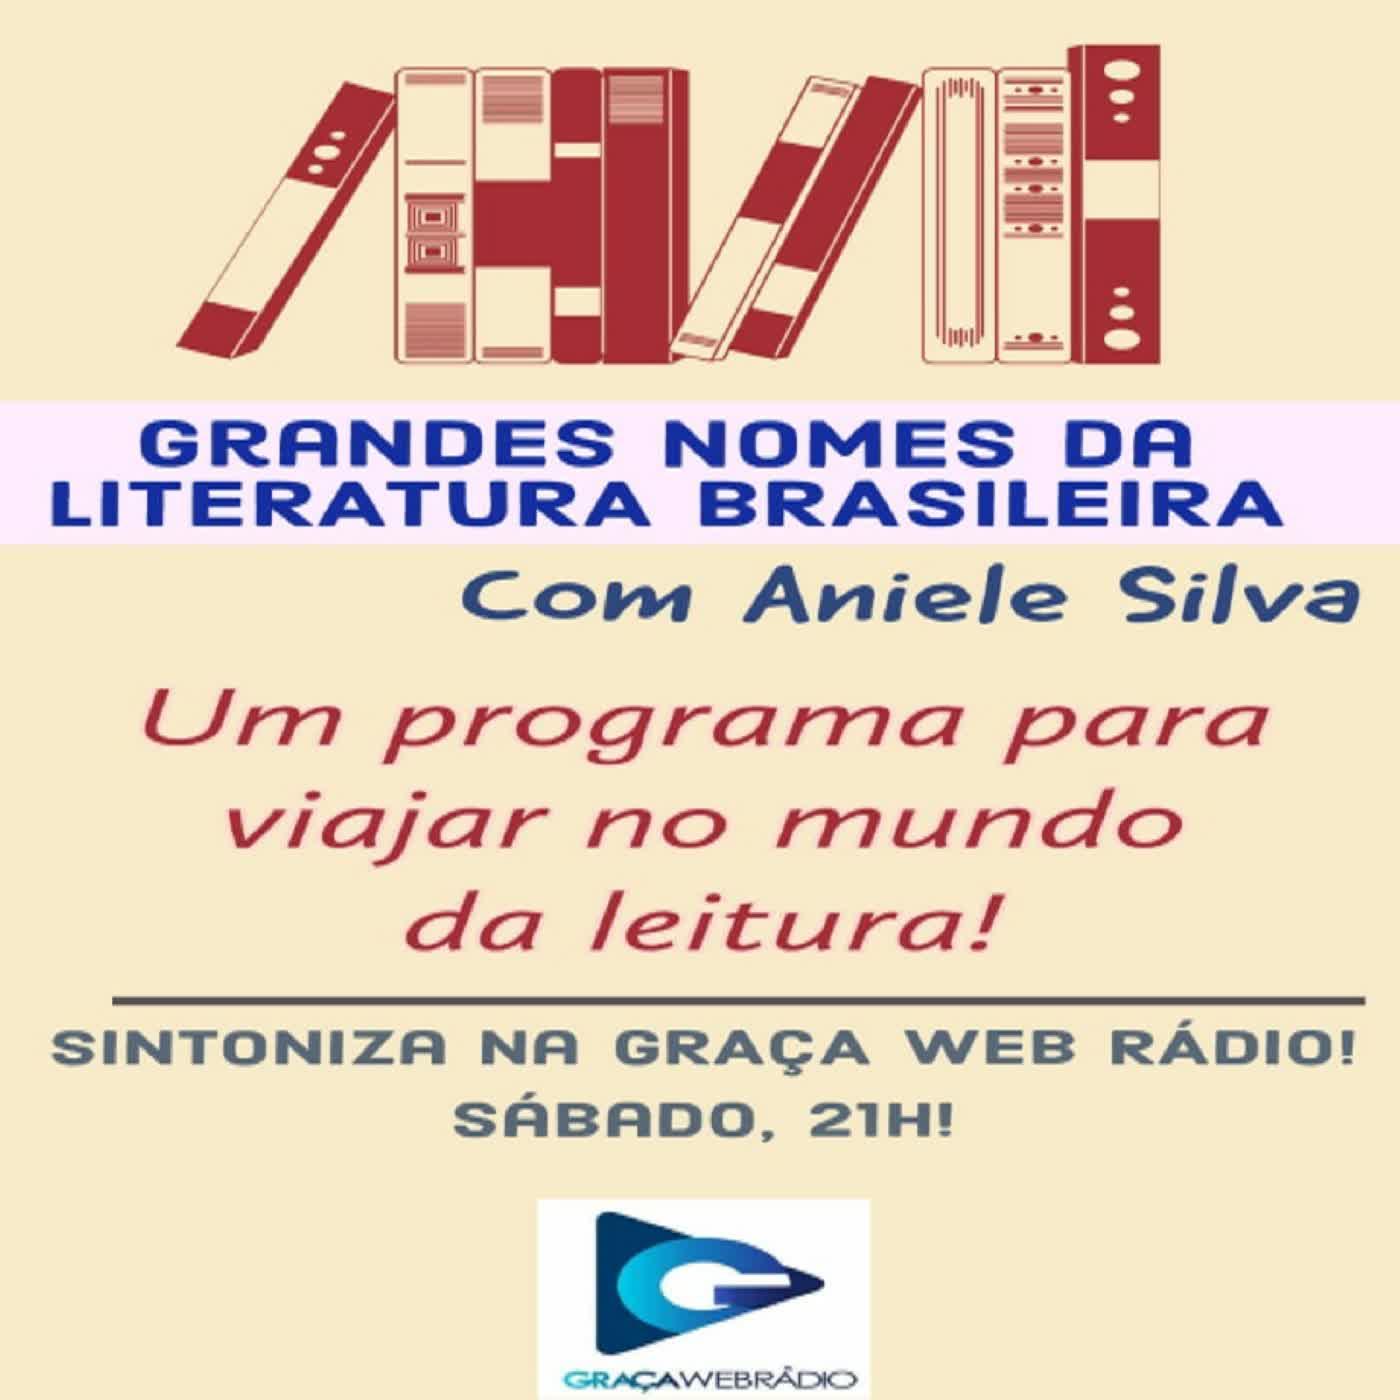 PGM GRANDES NOMES DA LITERATURA BRASILEIRA 05.09.20